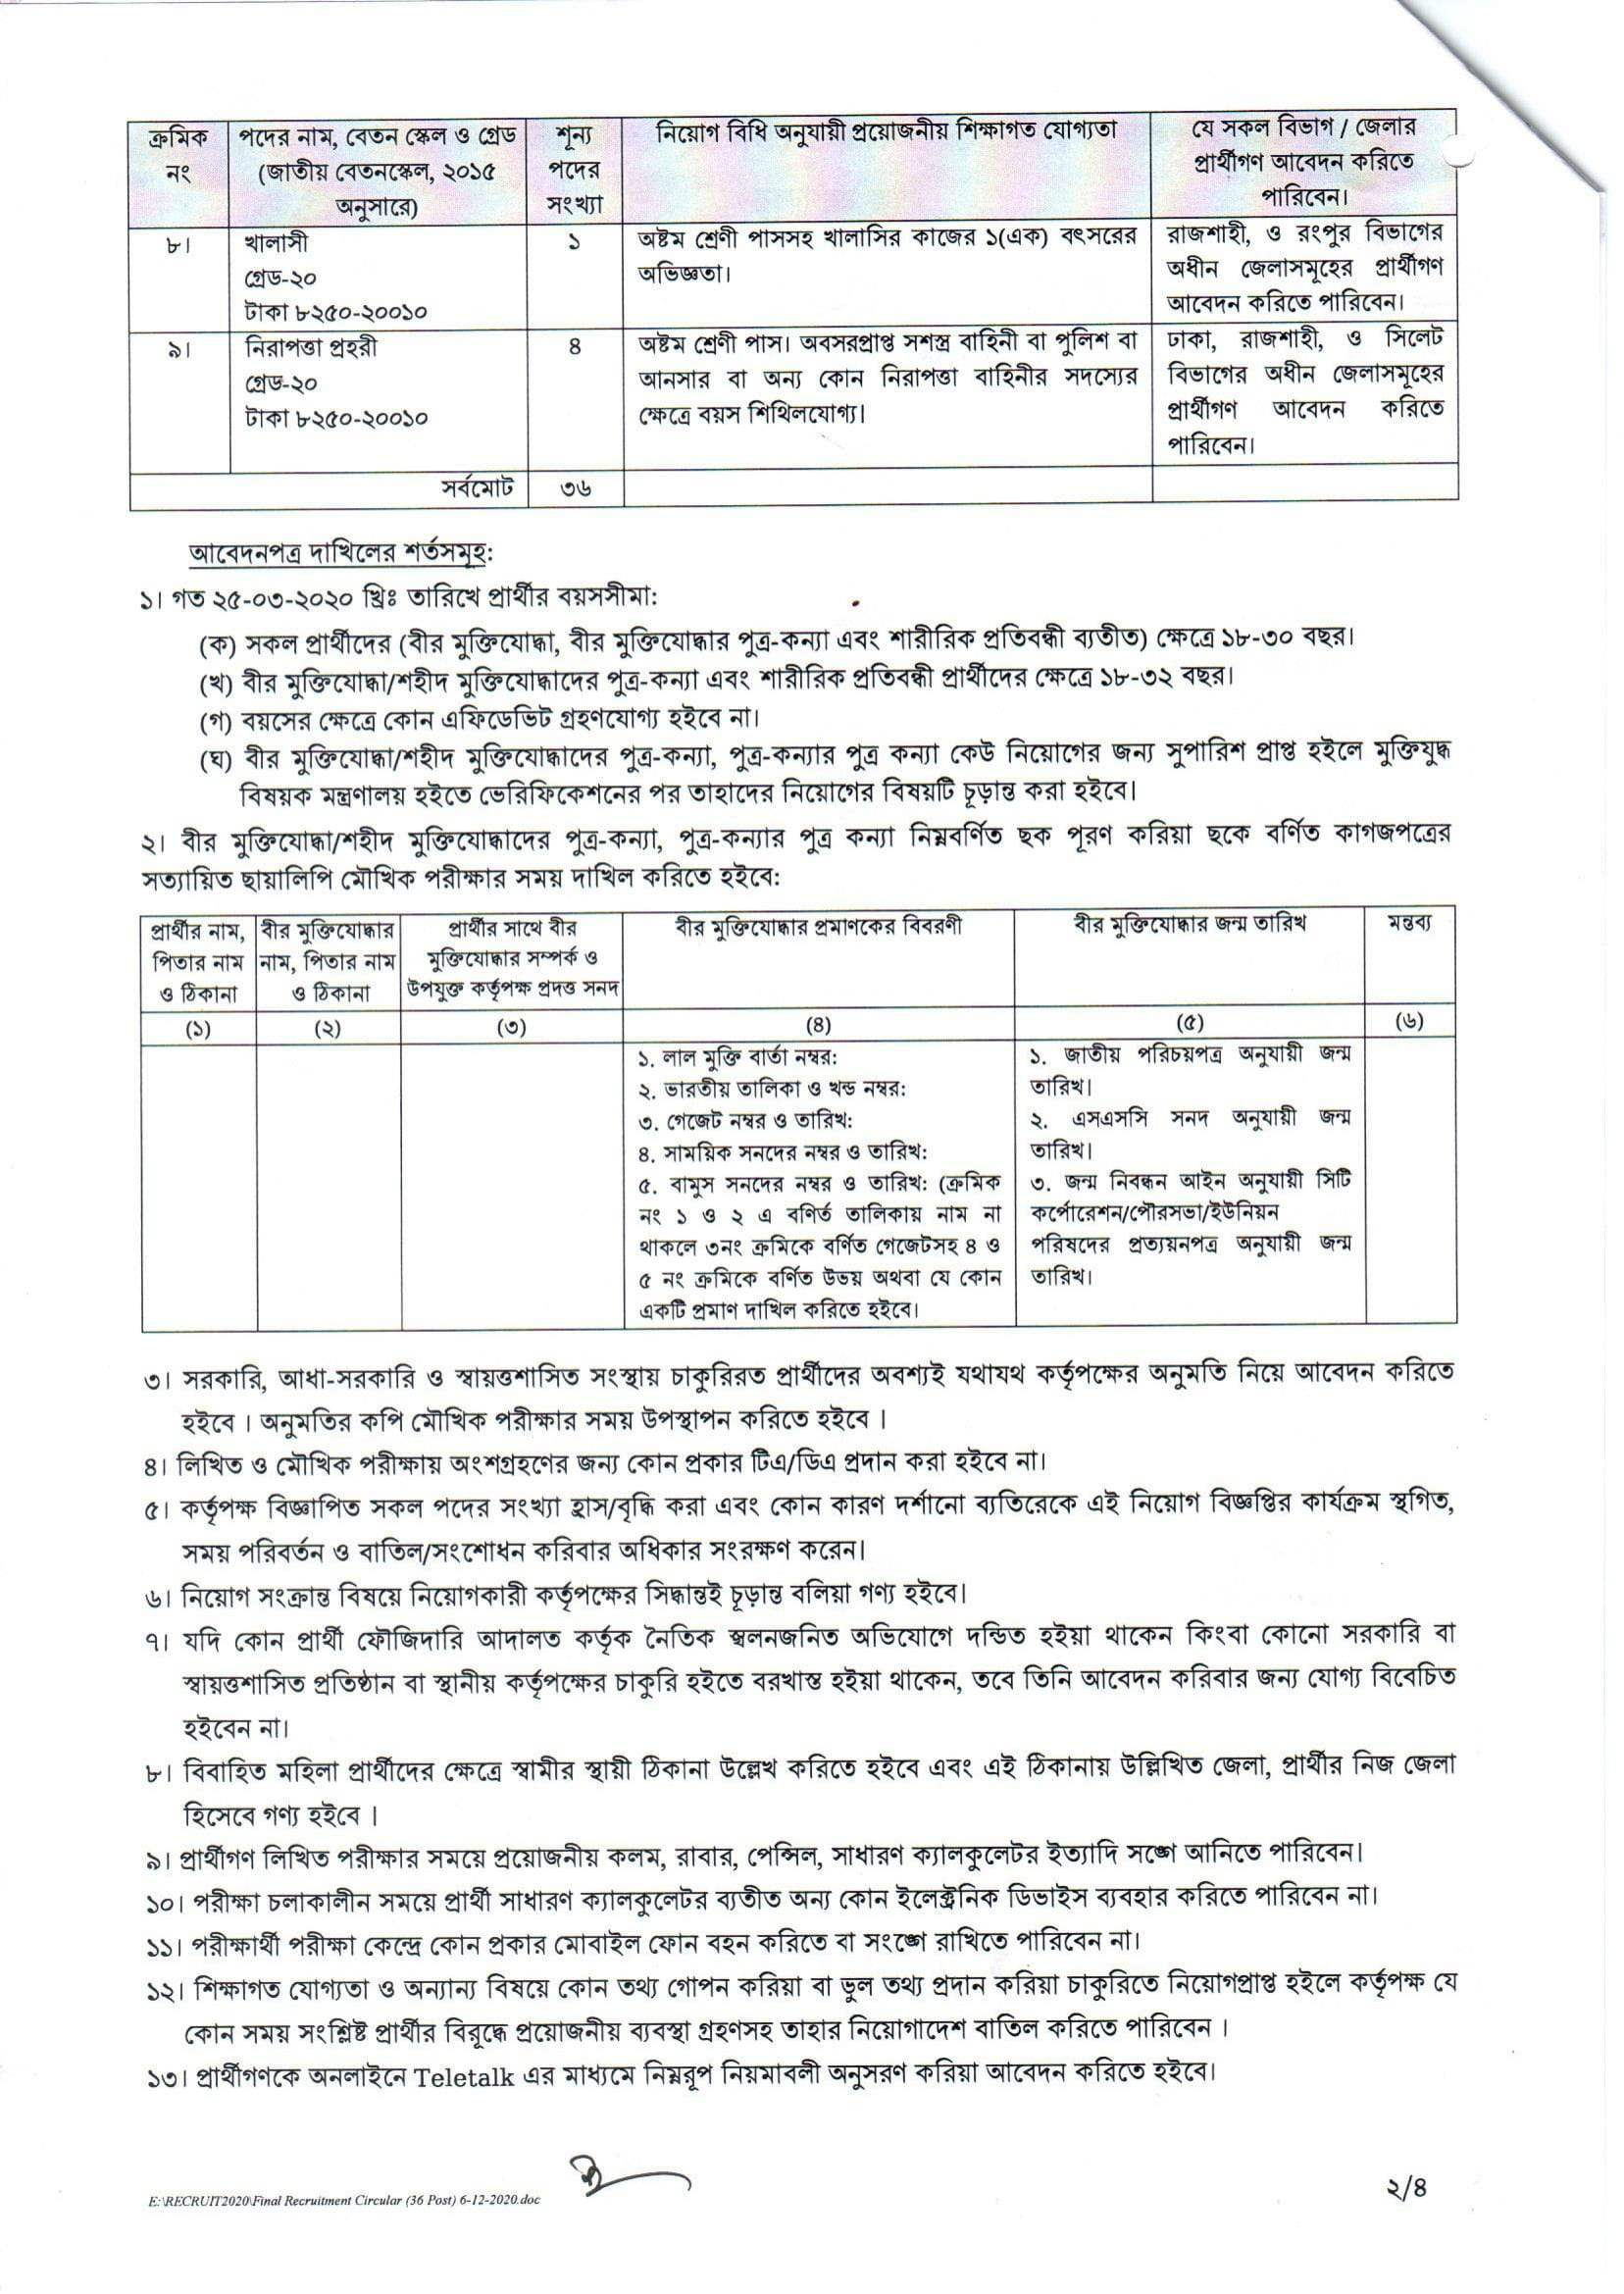 Bangladesh Standards and Testing Institution Job Circular 2020